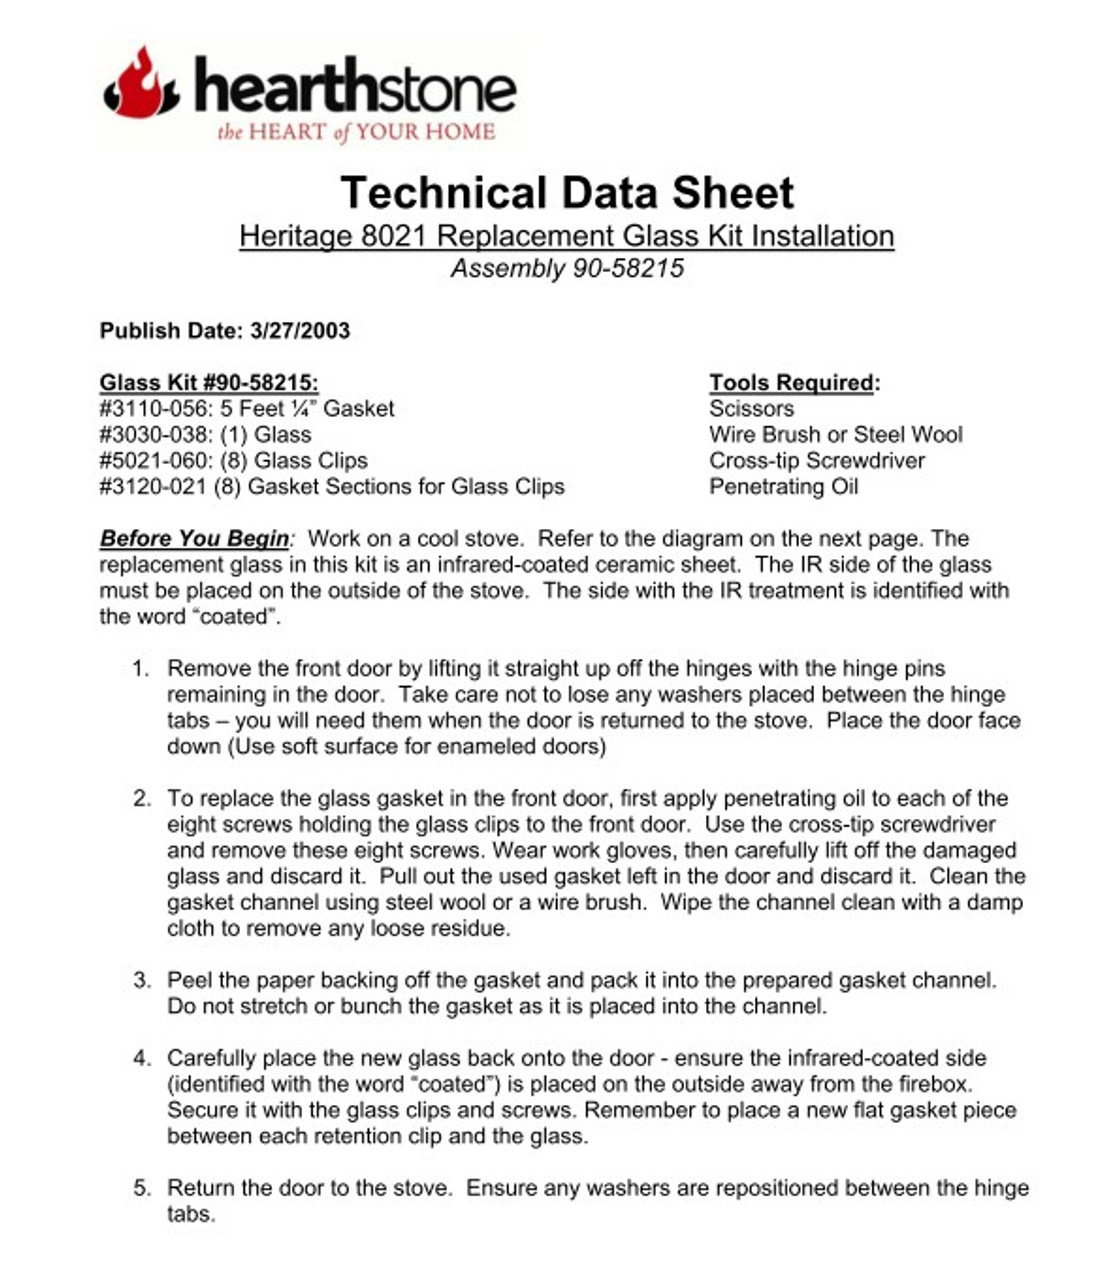 HearthStone Heritage 8021,8022,8023 Glass Kit 90-58215